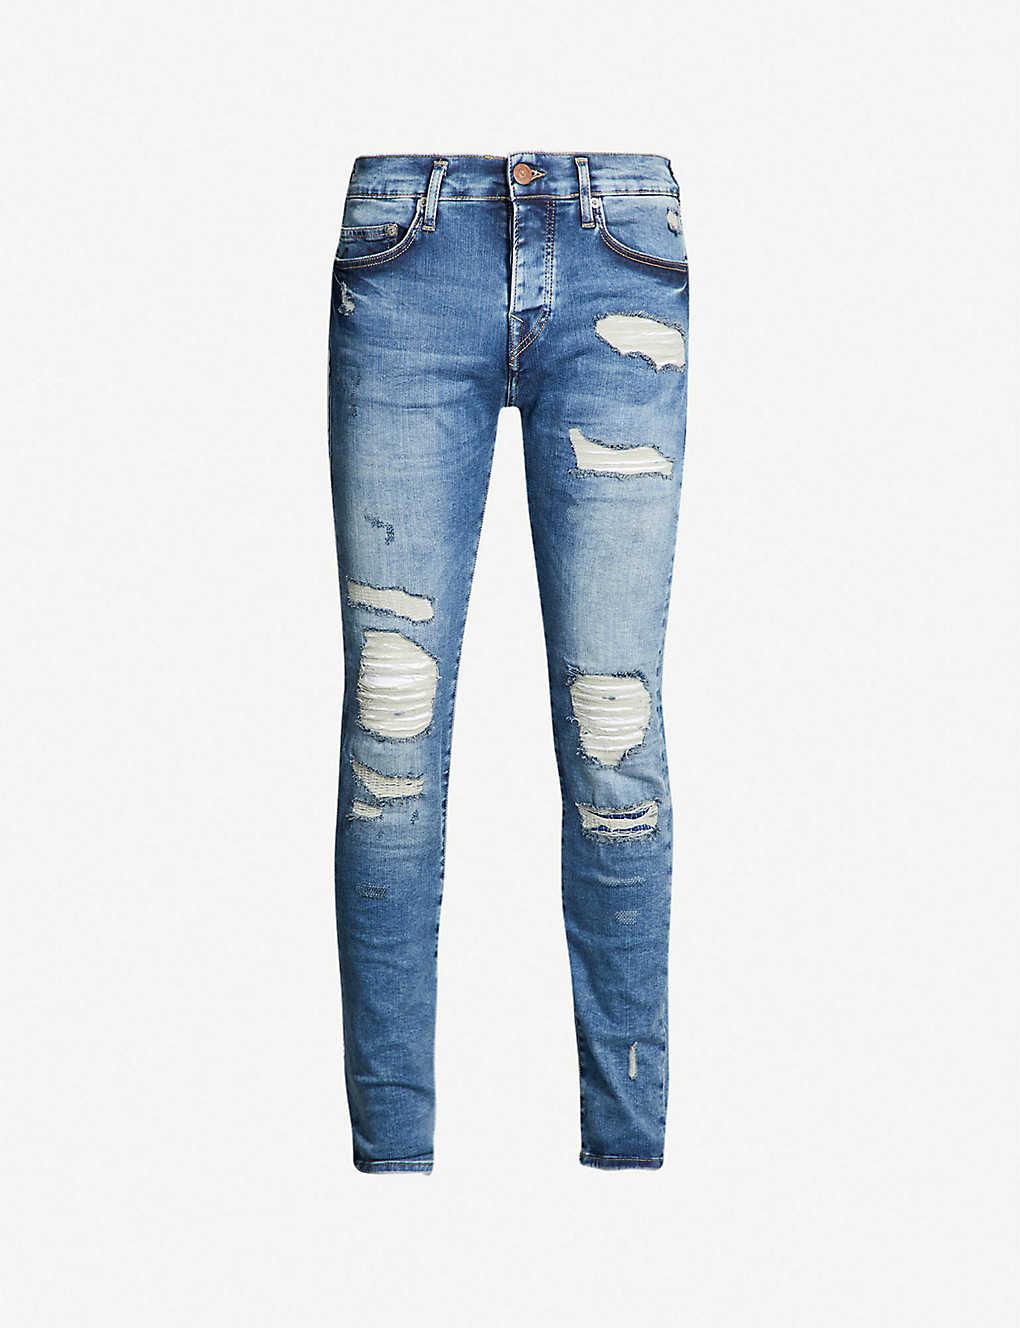 9328d5ba787 ... Rocco destroyed biker relaxed-fit skinny jeans - Blue denim ...